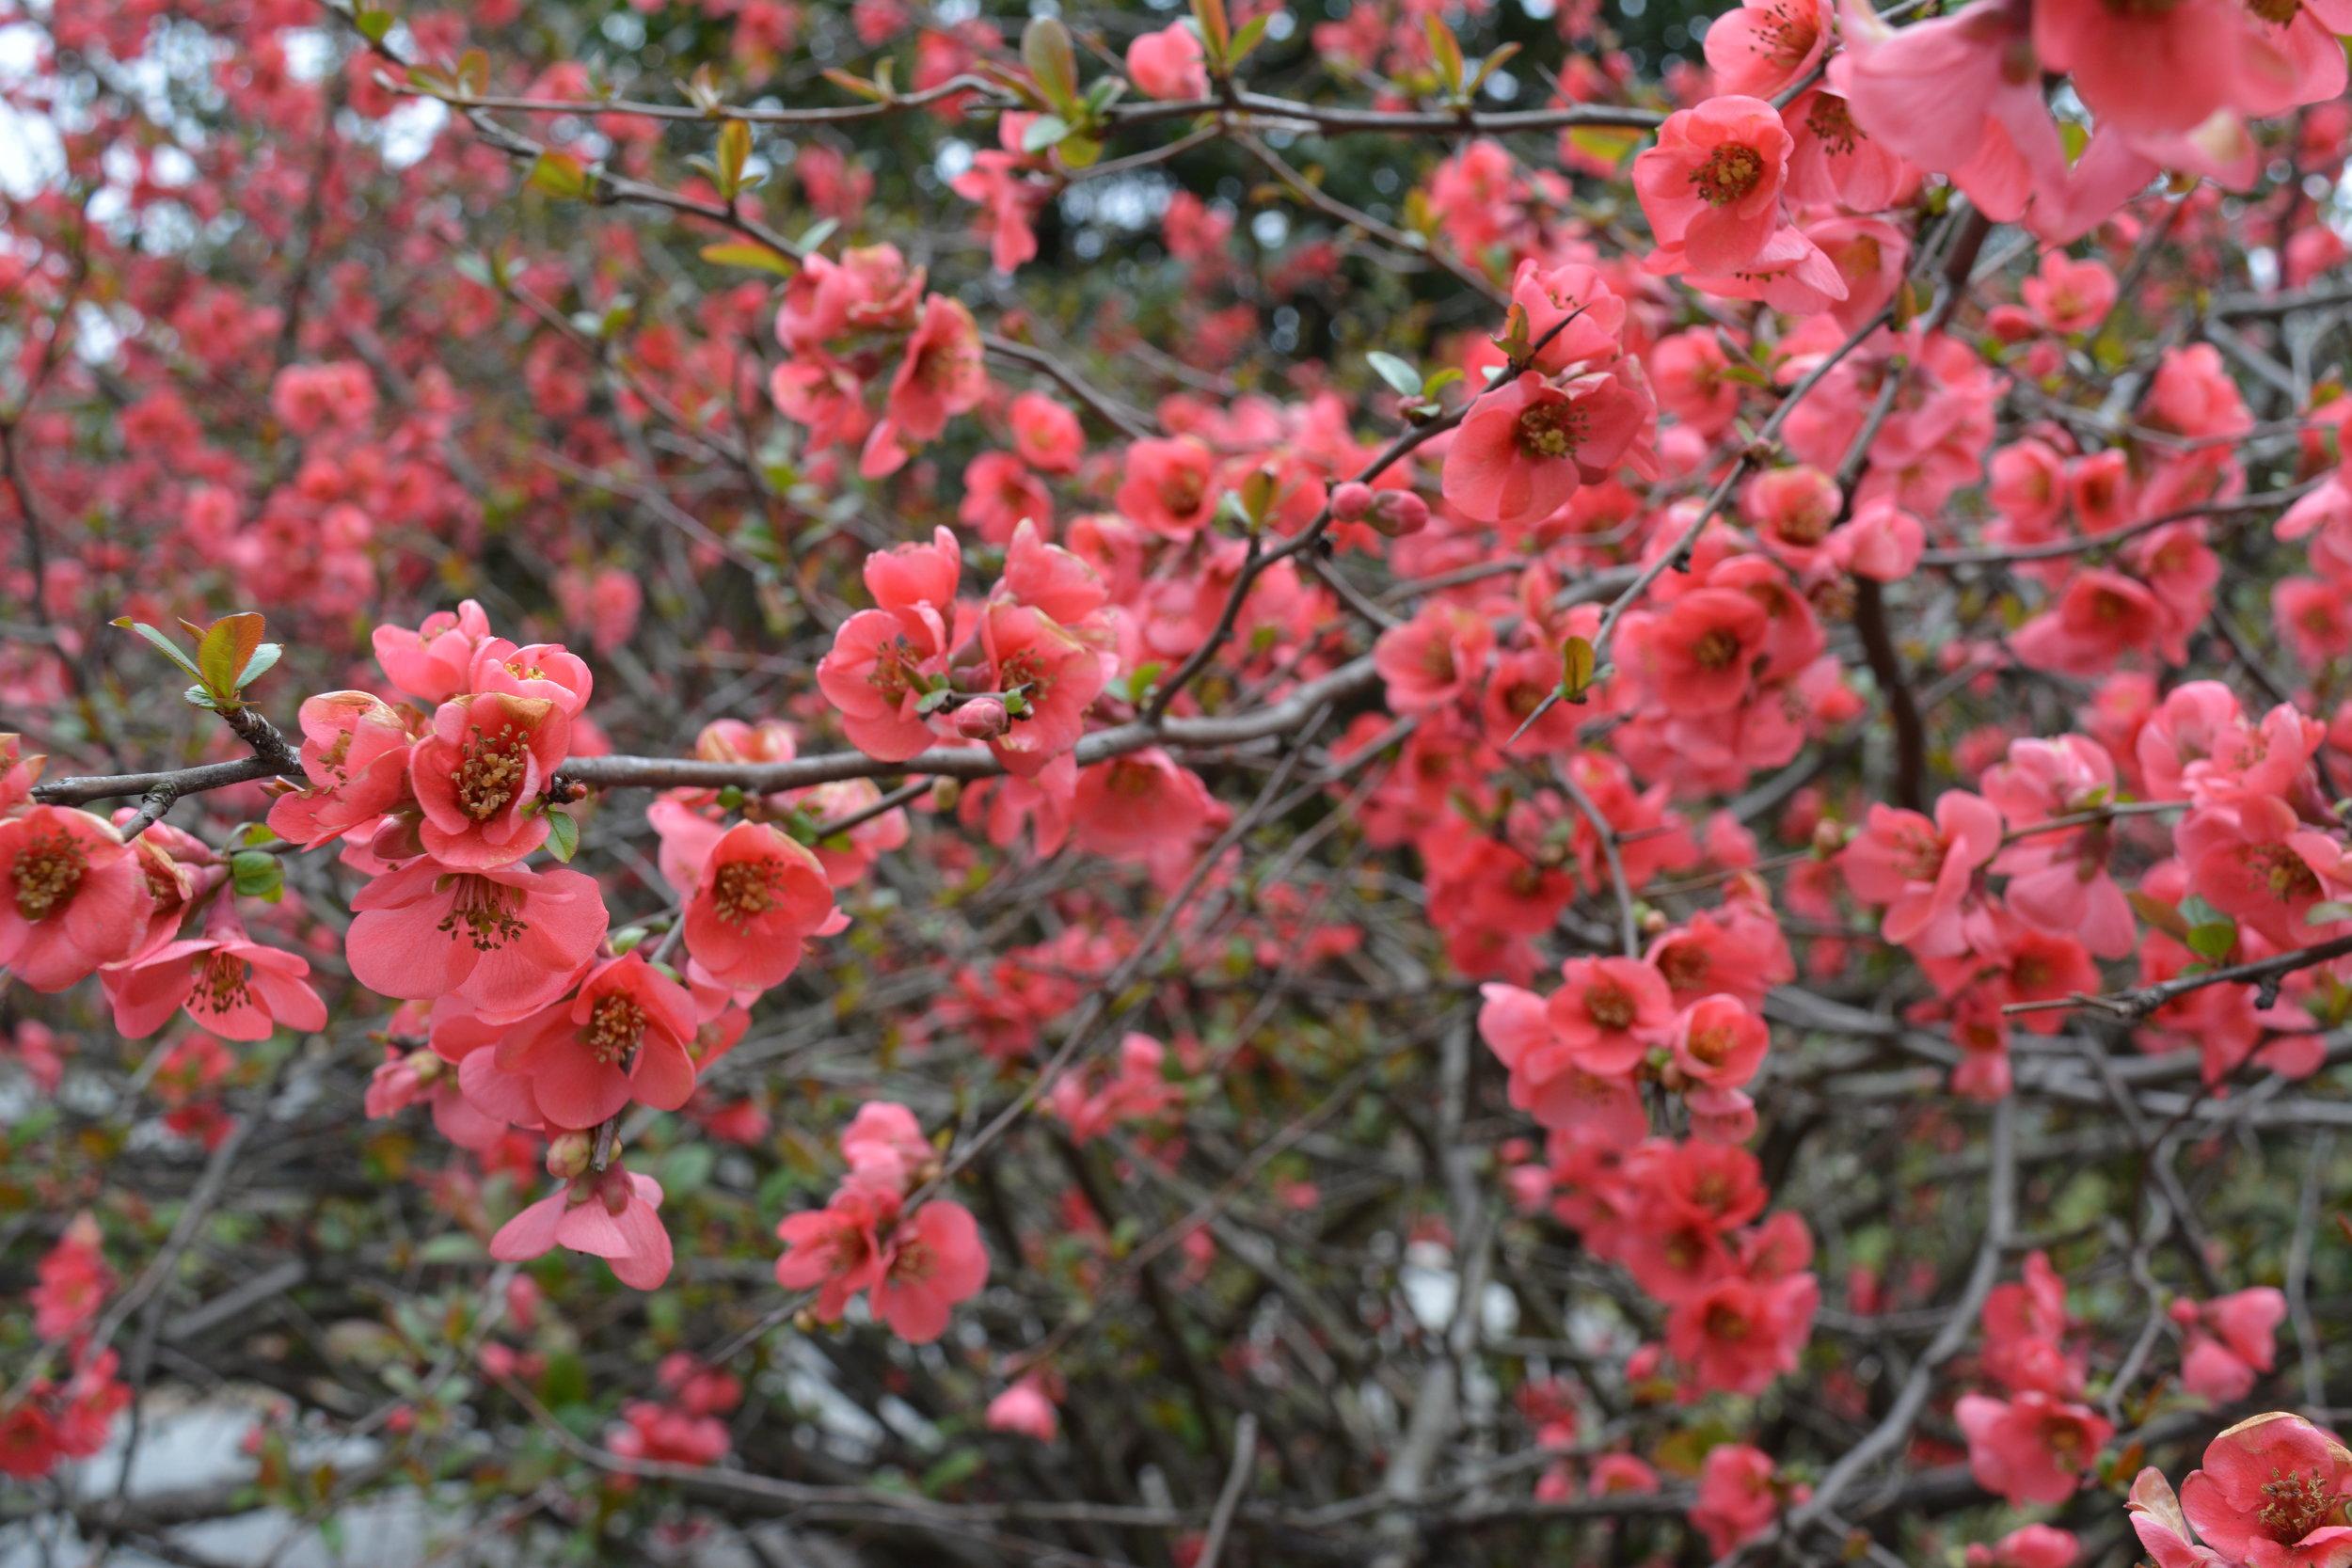 Quince bloom - Intreegue Design